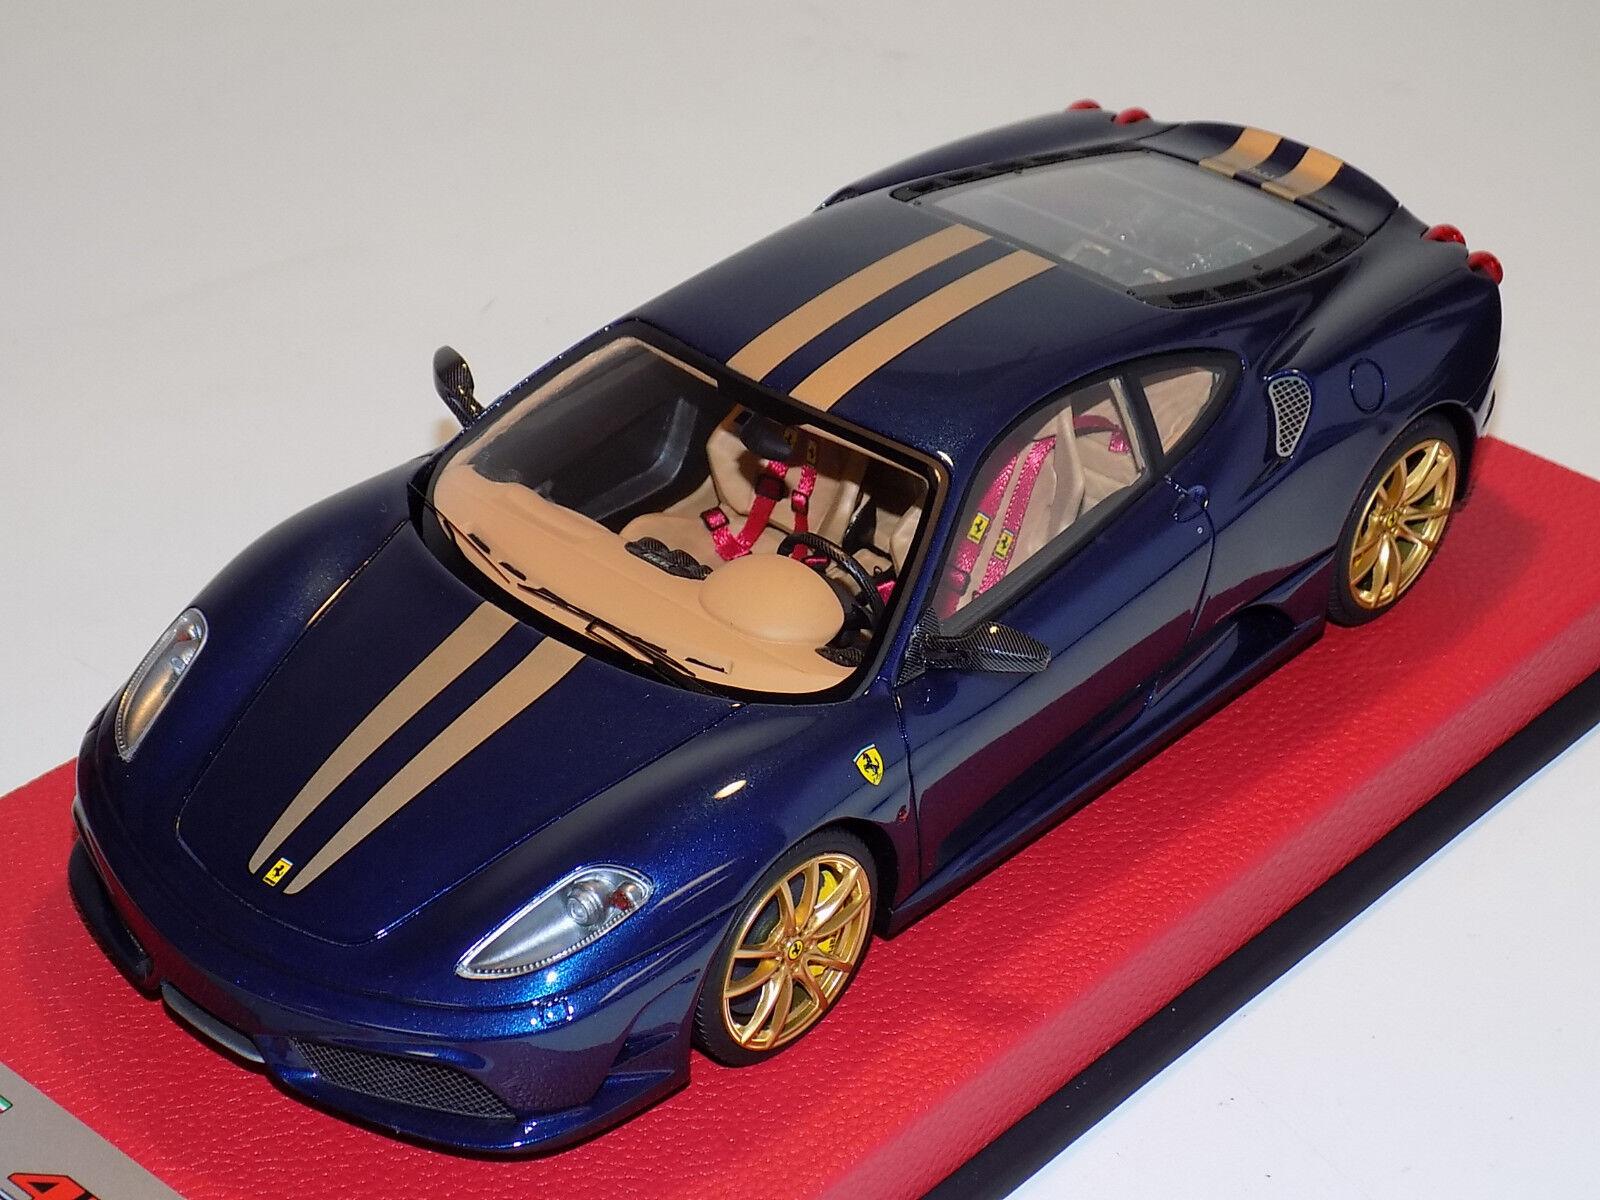 1  18 Looksmkonst MR Ferrari F430 Scuderia blå Tour de France guld Stripes Lim 25